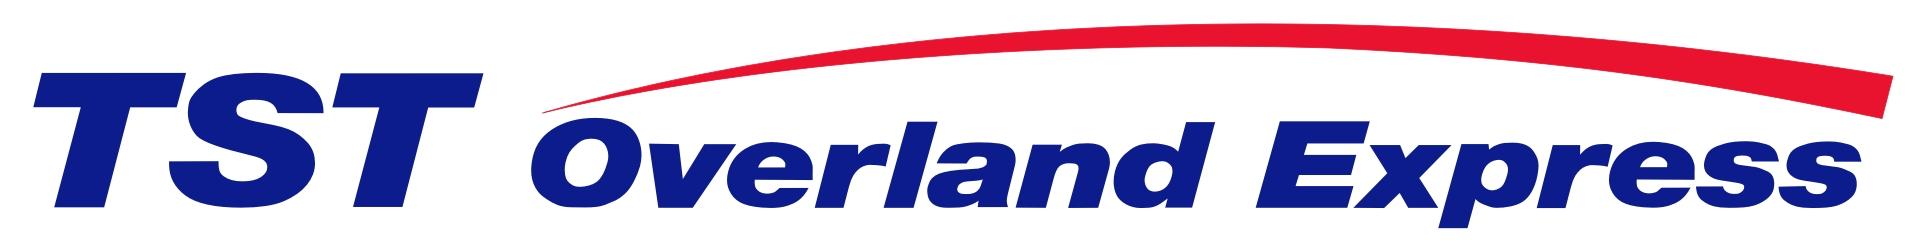 tst-overland-express-colour-rgb-2008